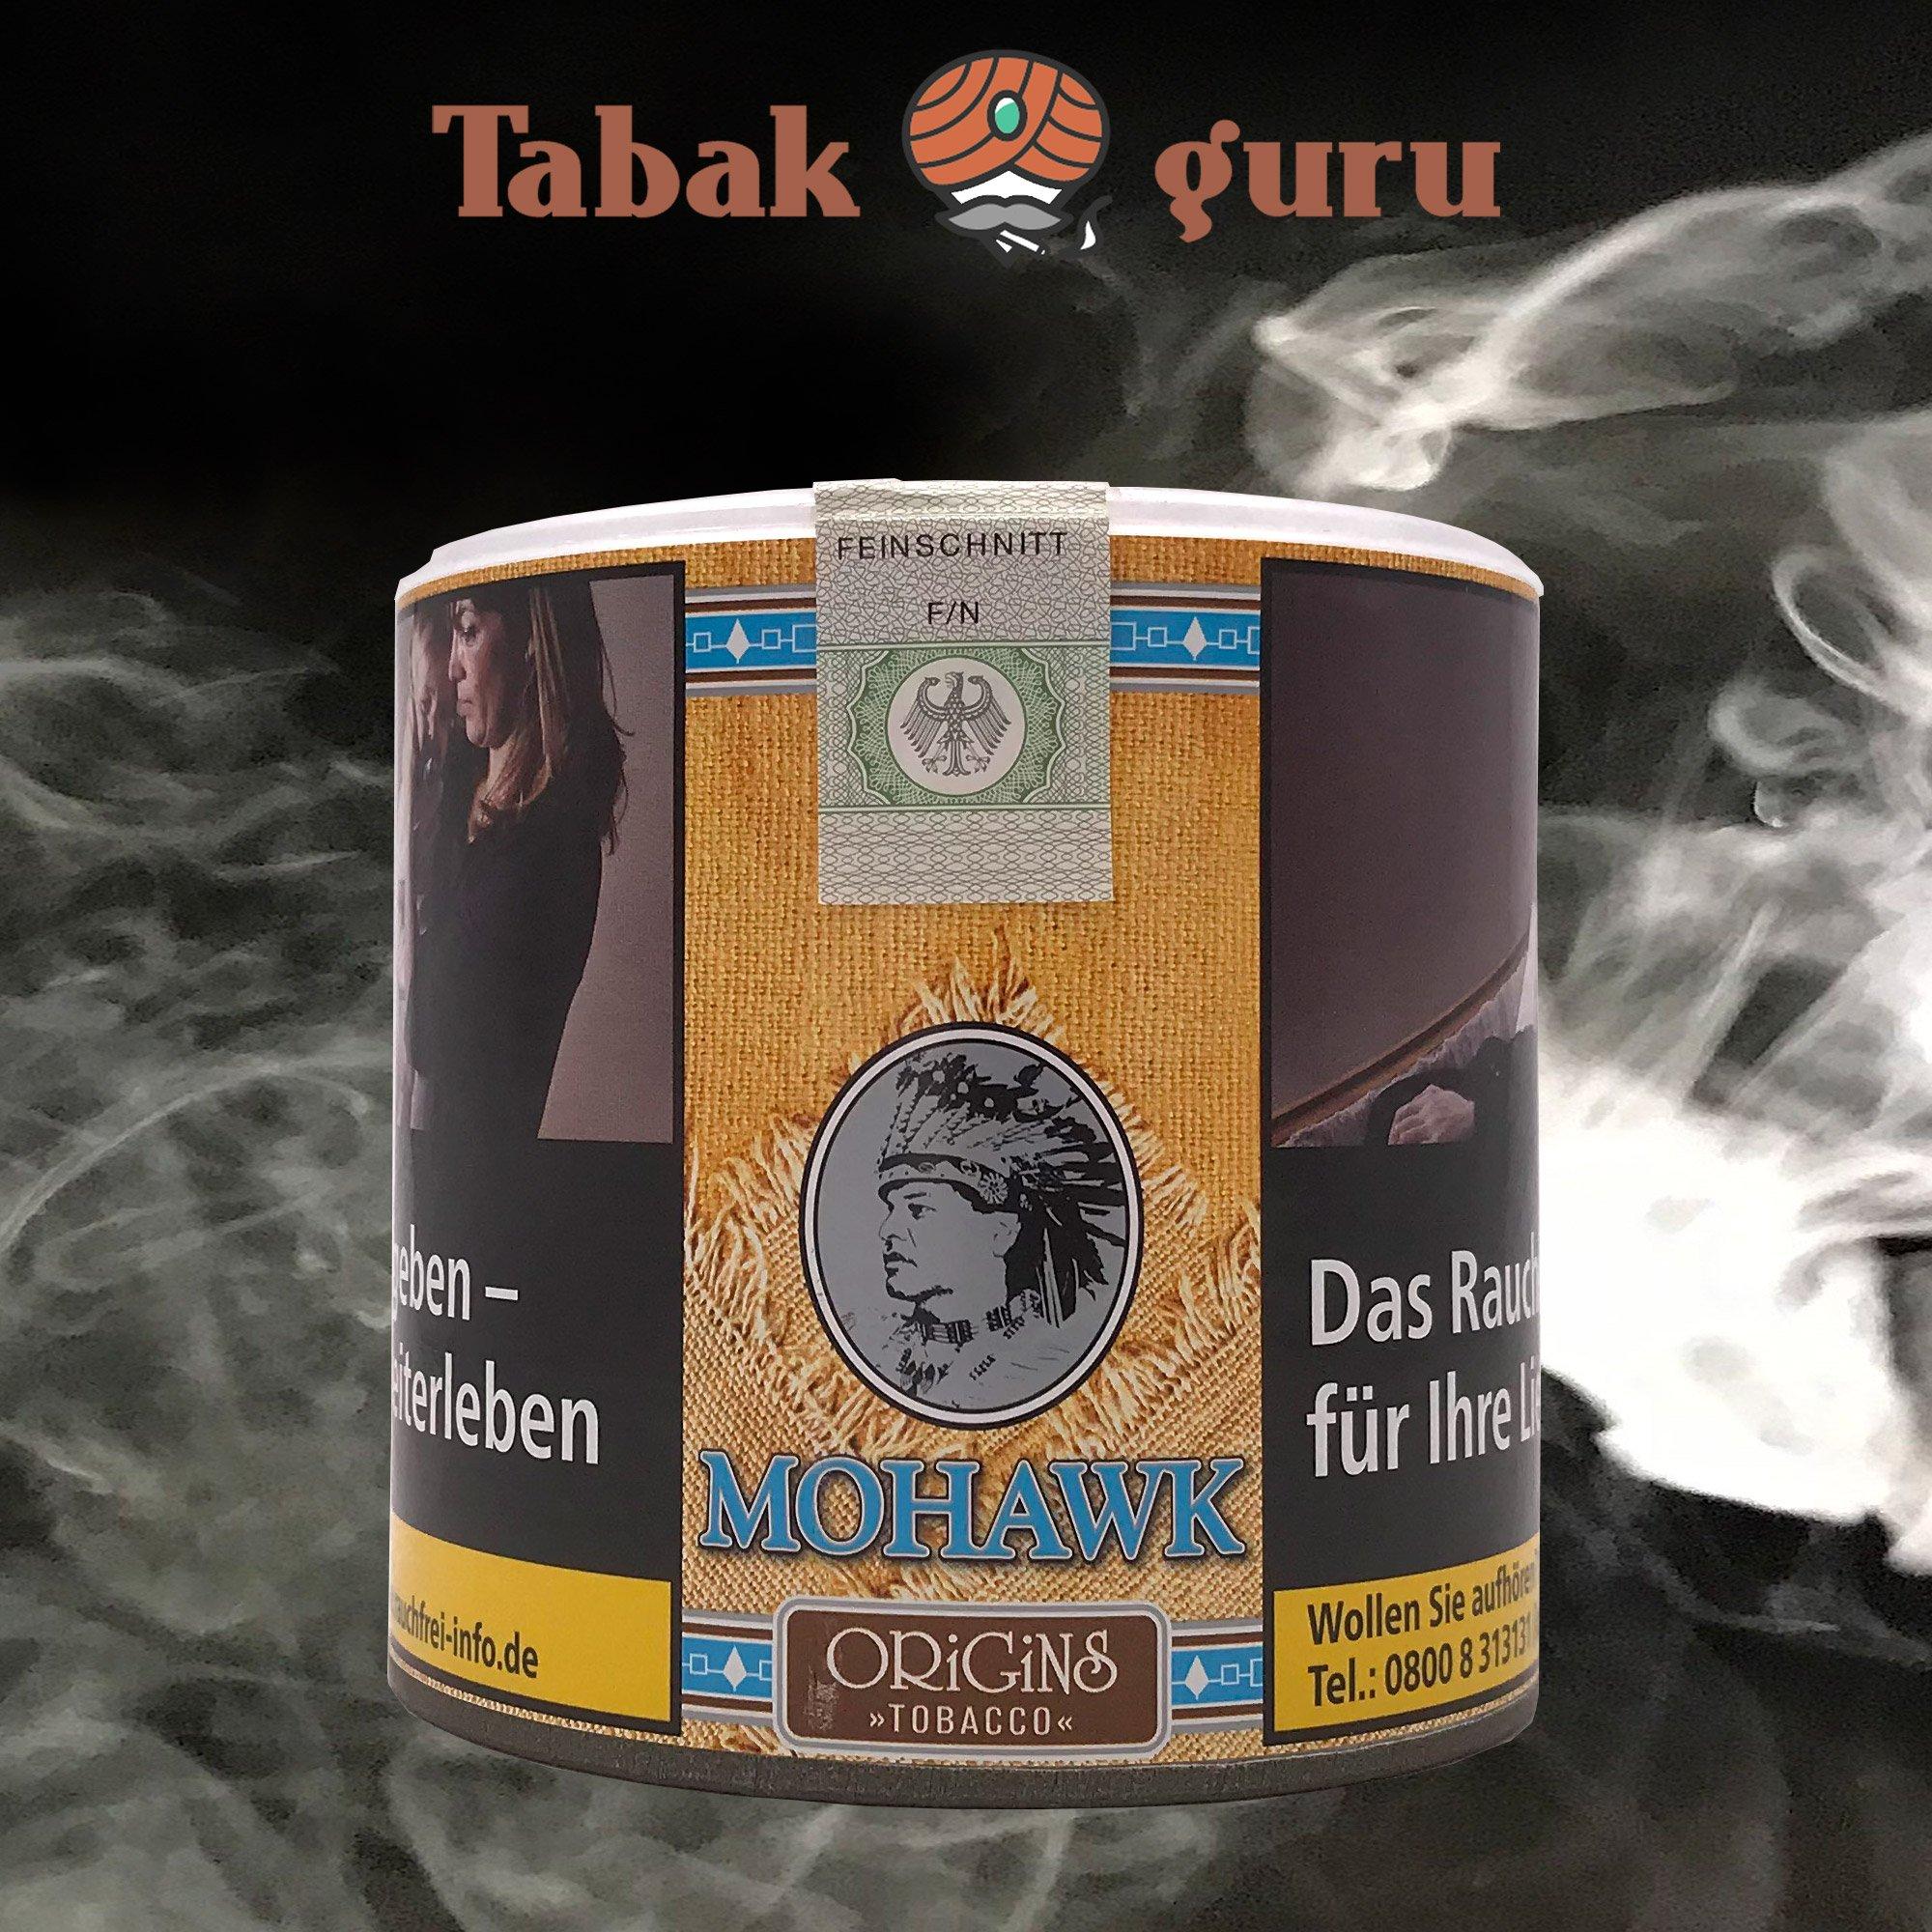 Mohawk Origins (o. Zusätze) Tobacco Volumen- / Zigarettentabak 70g Dose